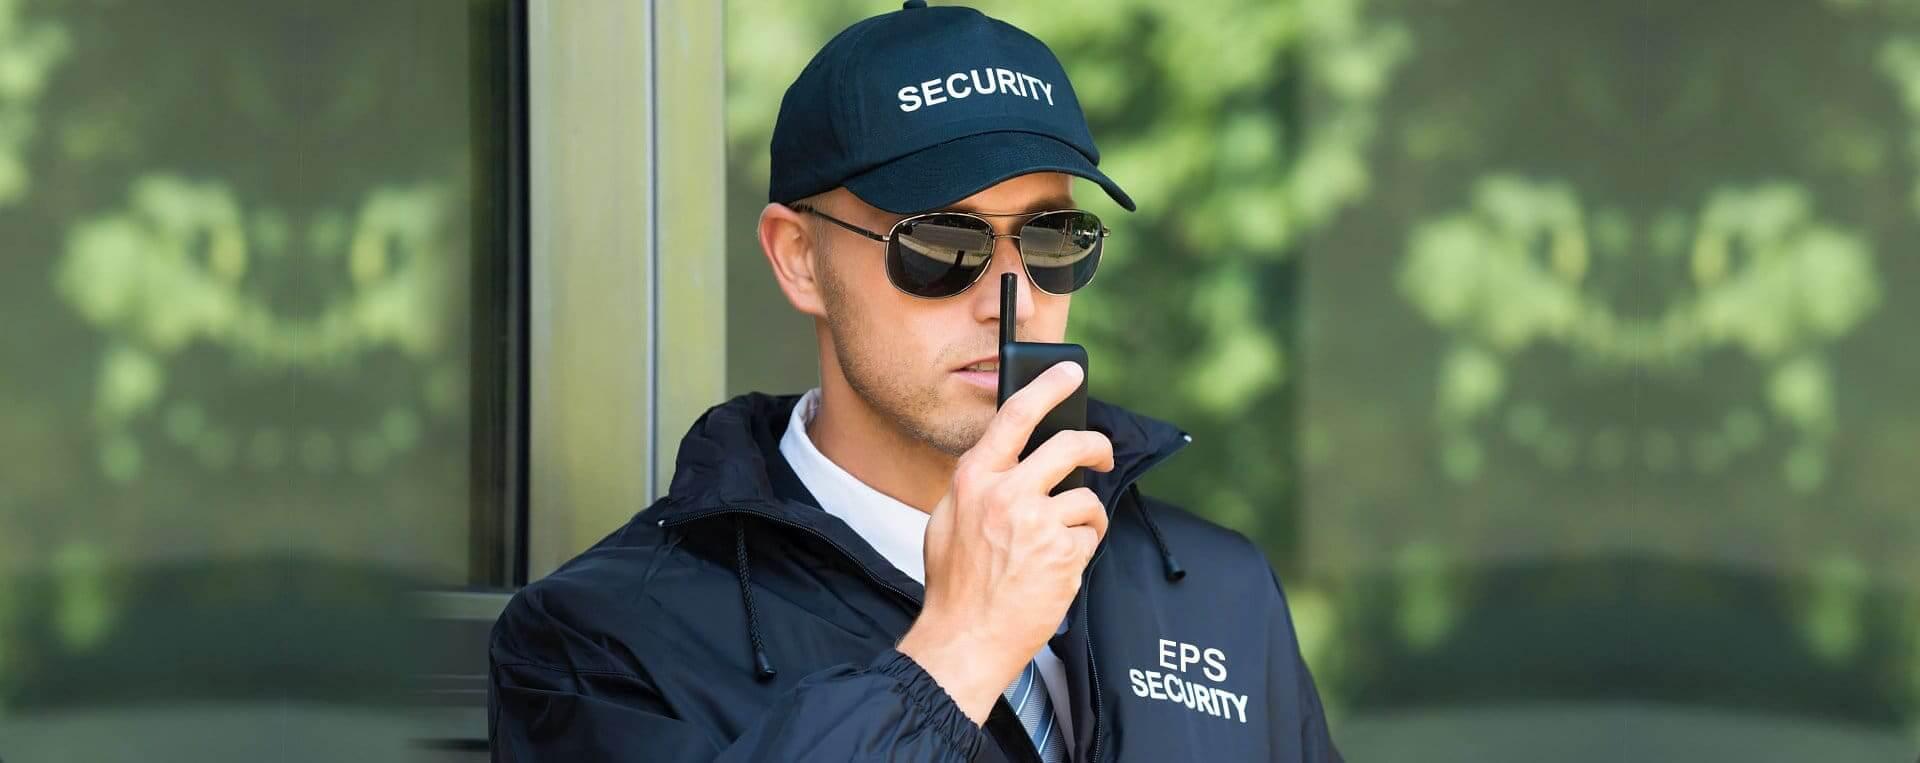 empire private security man